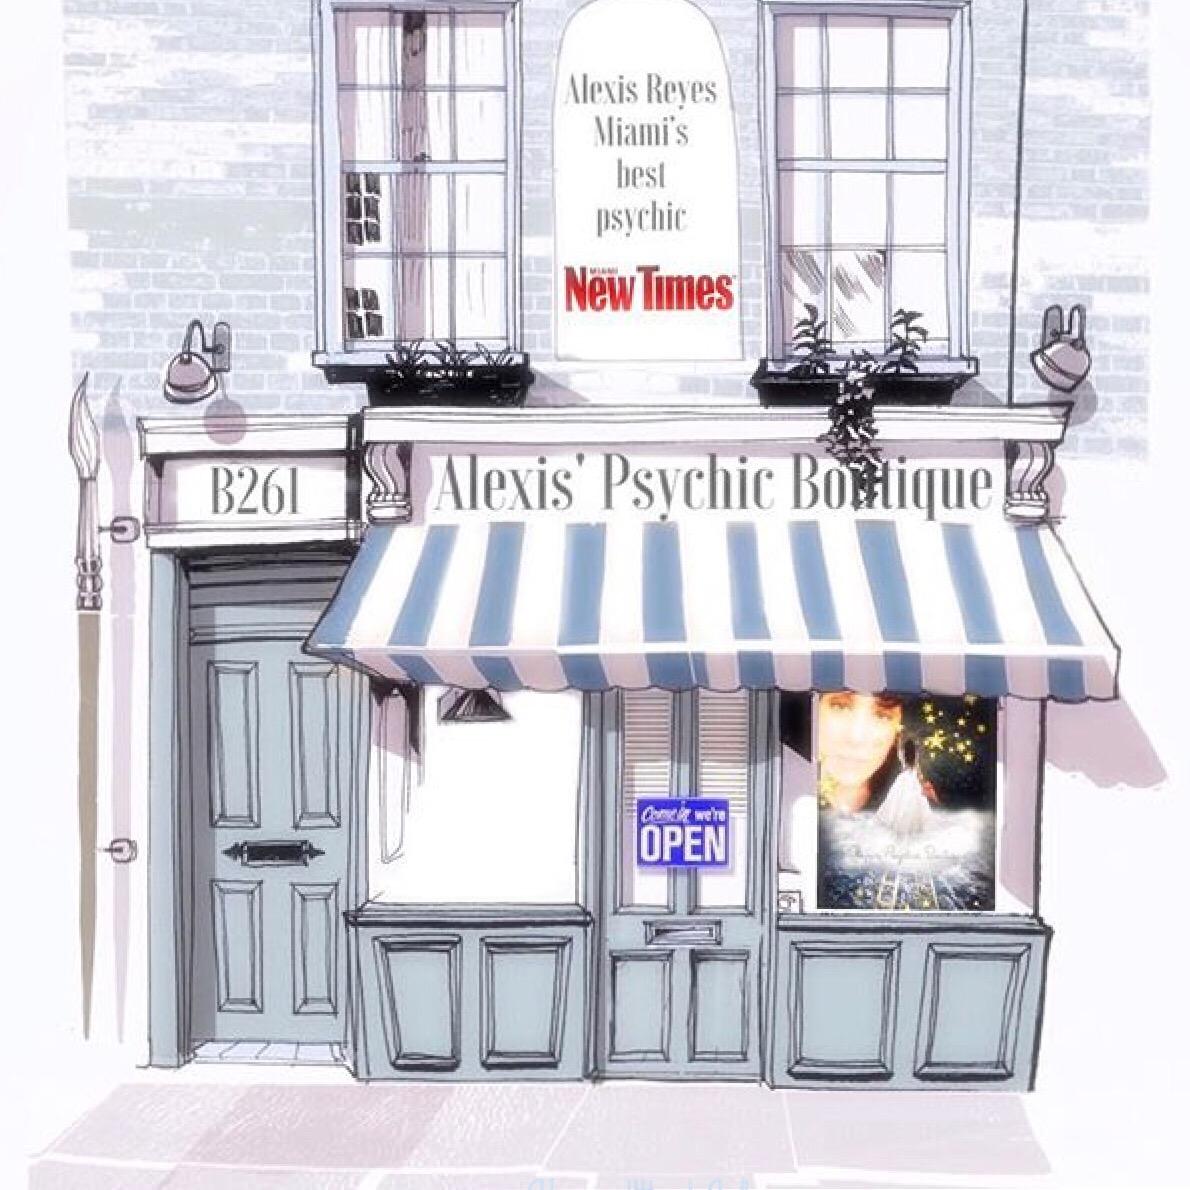 Alexis' Psychic Boutique – Alexis Reyes